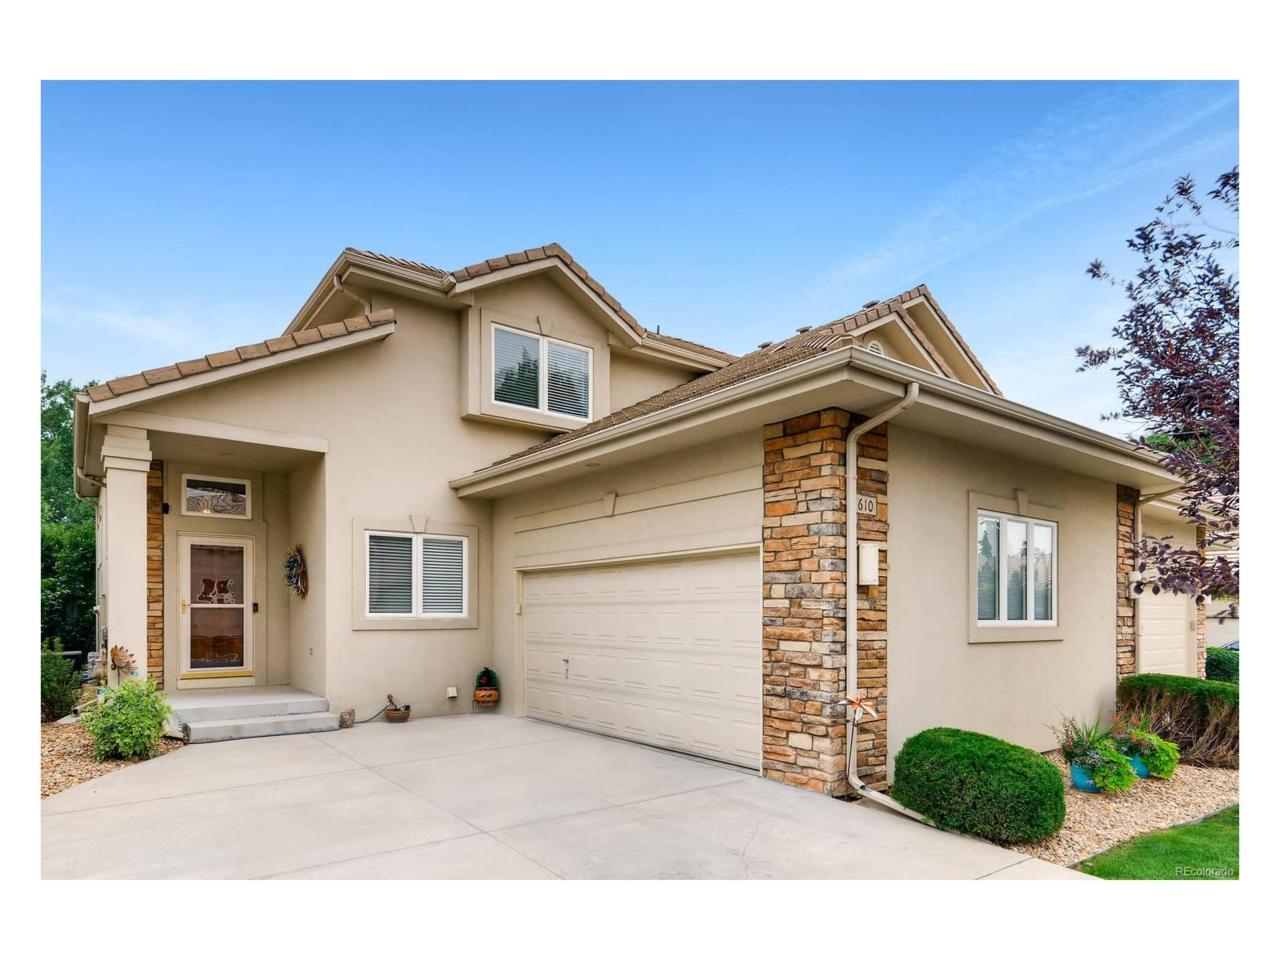 2610 S Kipling Court, Lakewood, CO 80227 (MLS #2416875) :: 8z Real Estate